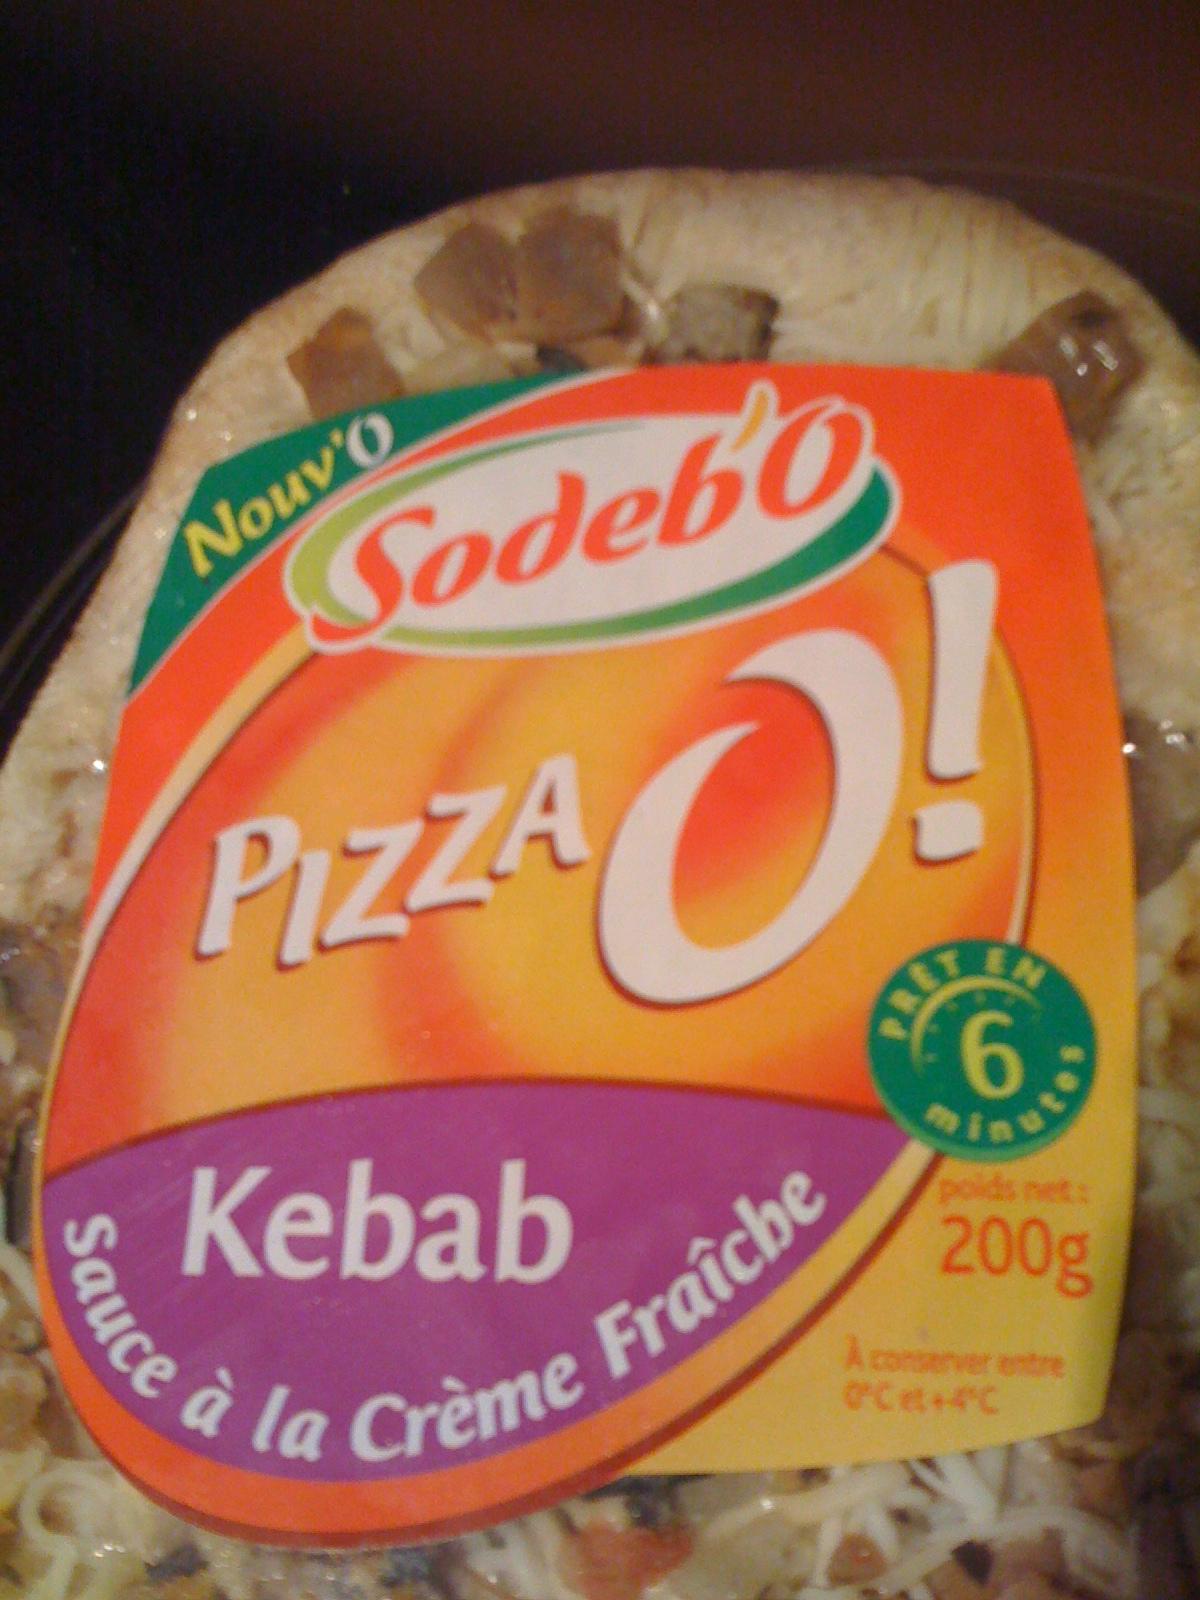 Pizza Kebab Sodebo